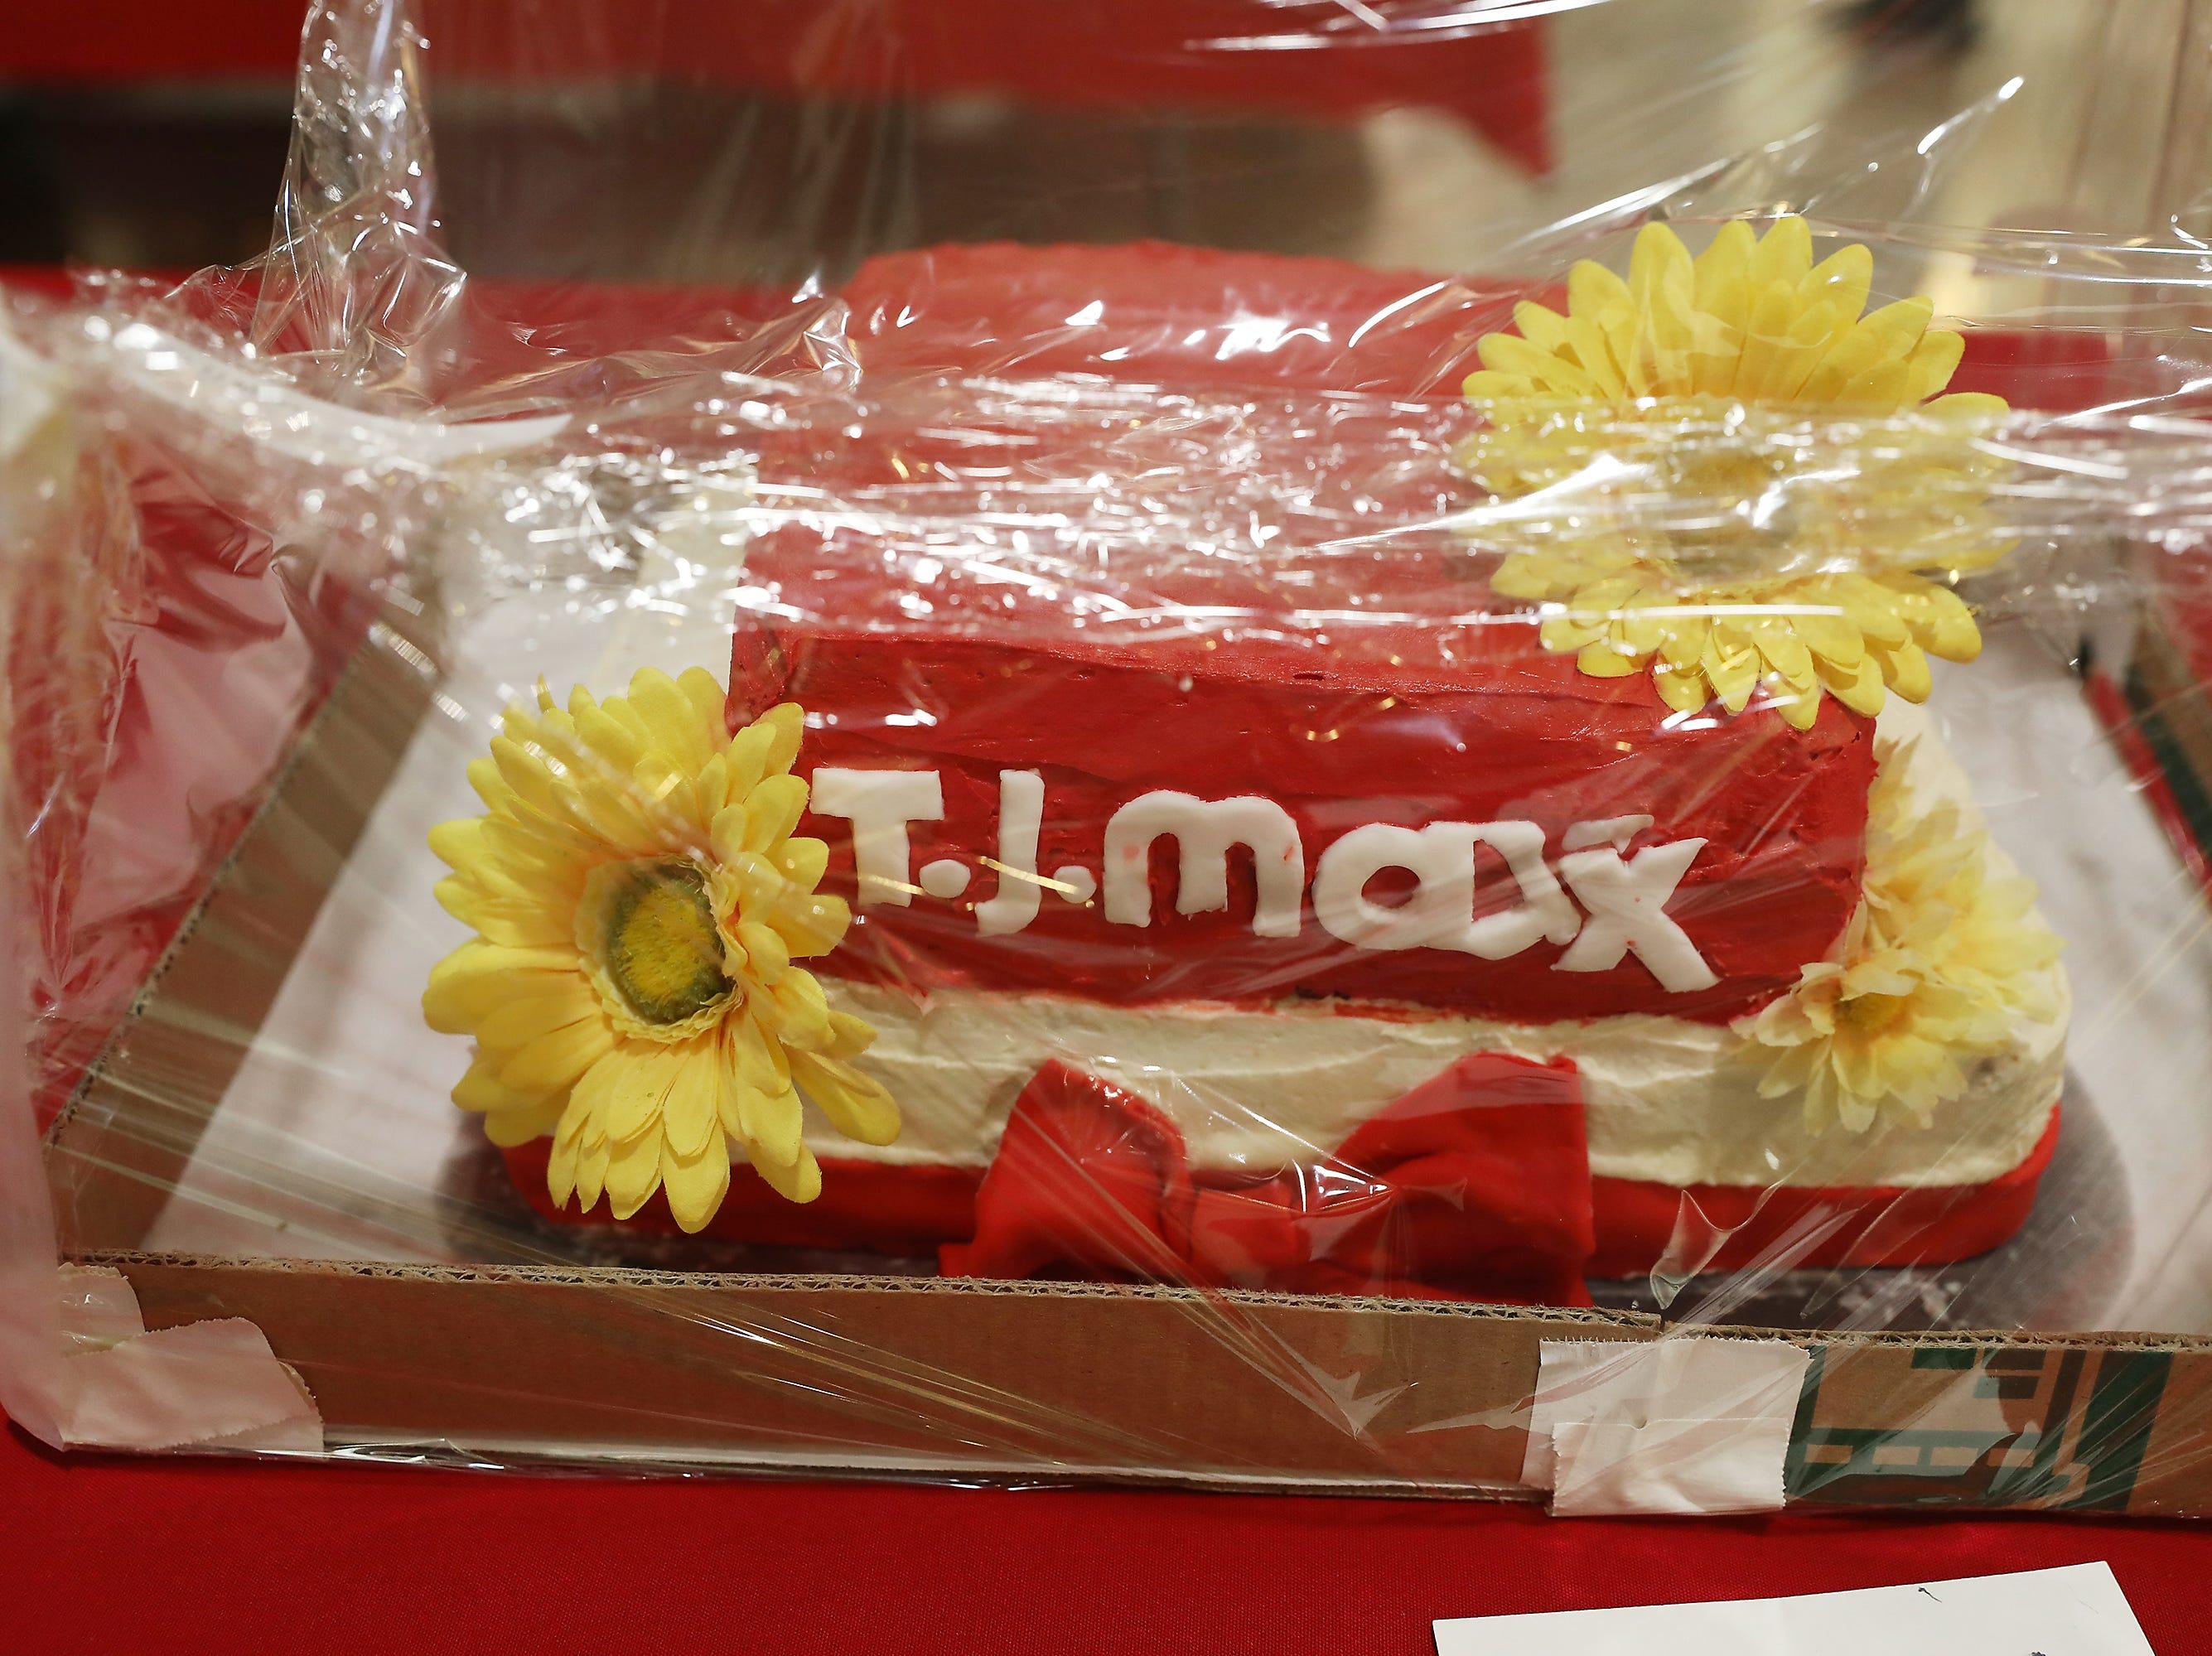 9:15 A.M. Friday cake 235 TJ Maxx - $100 TJ Maxx gift card